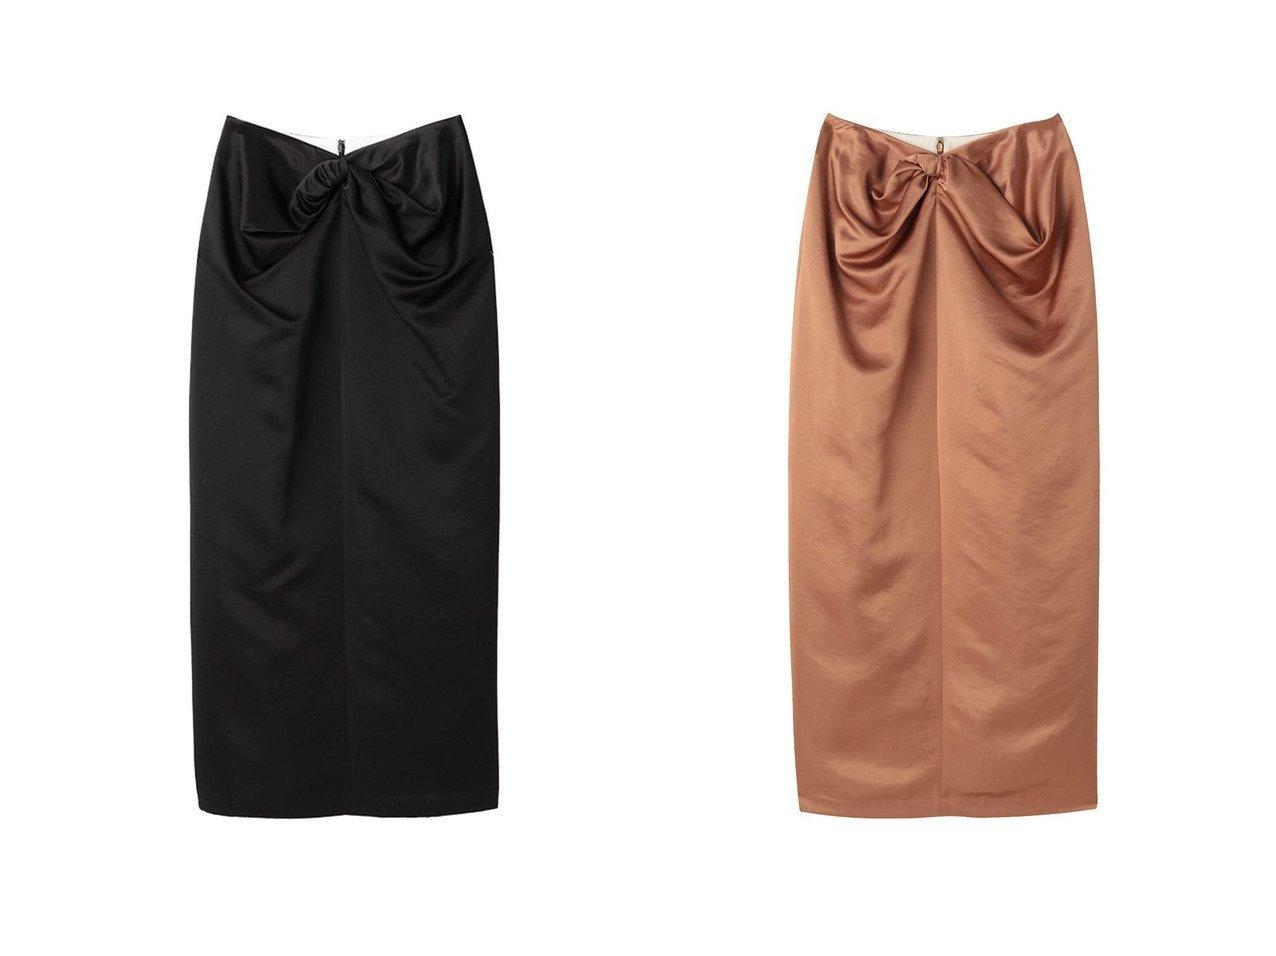 【ETRE TOKYO/エトレトウキョウ】のサテンドレープスカート 【スカート】おすすめ!人気、トレンド・レディースファッションの通販 おすすめで人気の流行・トレンド、ファッションの通販商品 インテリア・家具・メンズファッション・キッズファッション・レディースファッション・服の通販 founy(ファニー) https://founy.com/ ファッション Fashion レディースファッション WOMEN スカート Skirt ロングスカート Long Skirt サテン シンプル ツイスト ドレープ ロング 今季 |ID:crp329100000045116